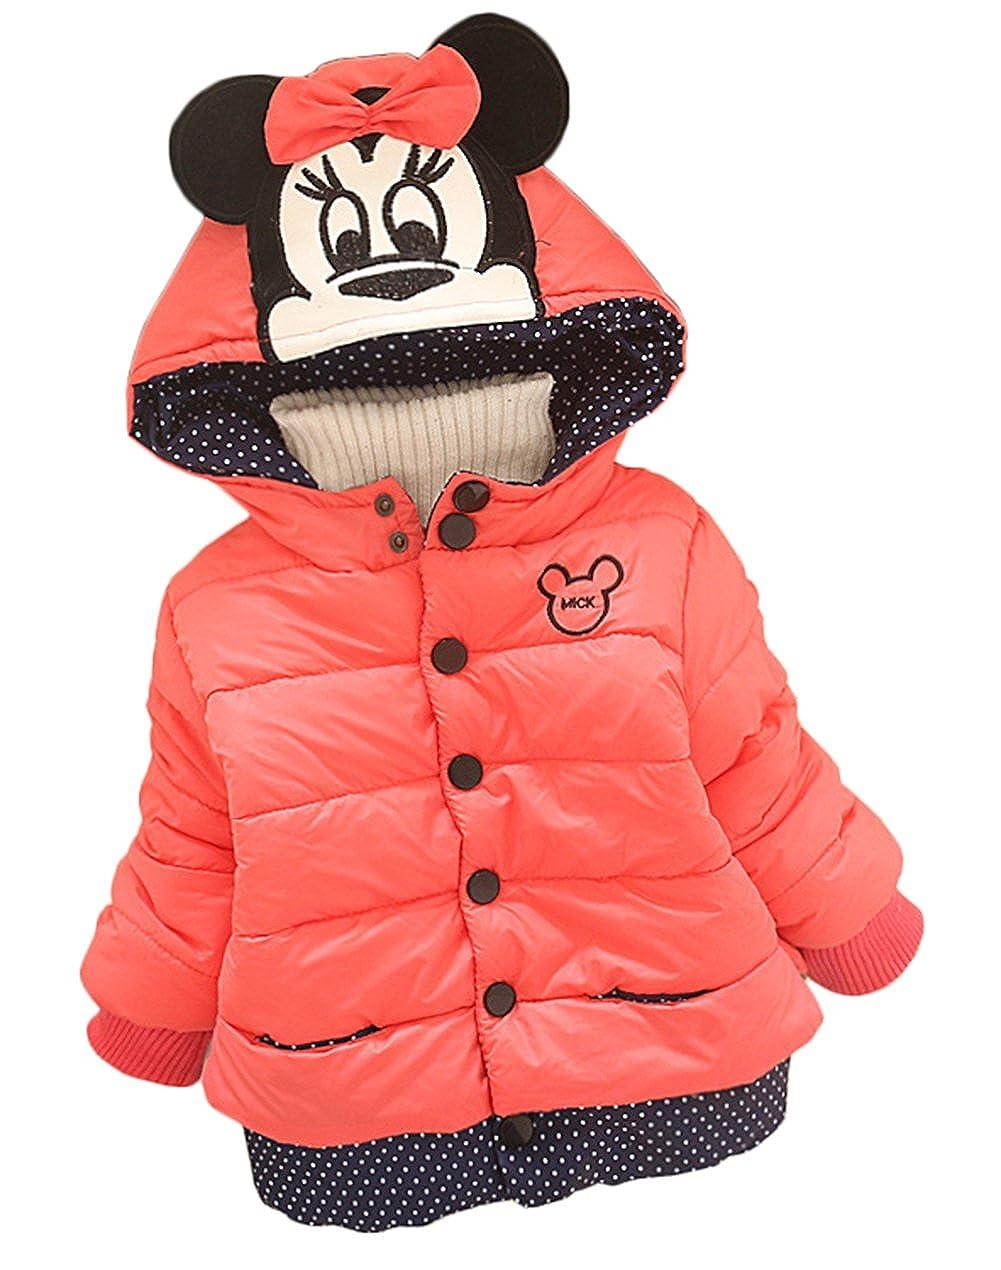 Lemonkids Kids Girl Winter Hooded Cartoon Outwear Quilted Fleece Jacket Coat